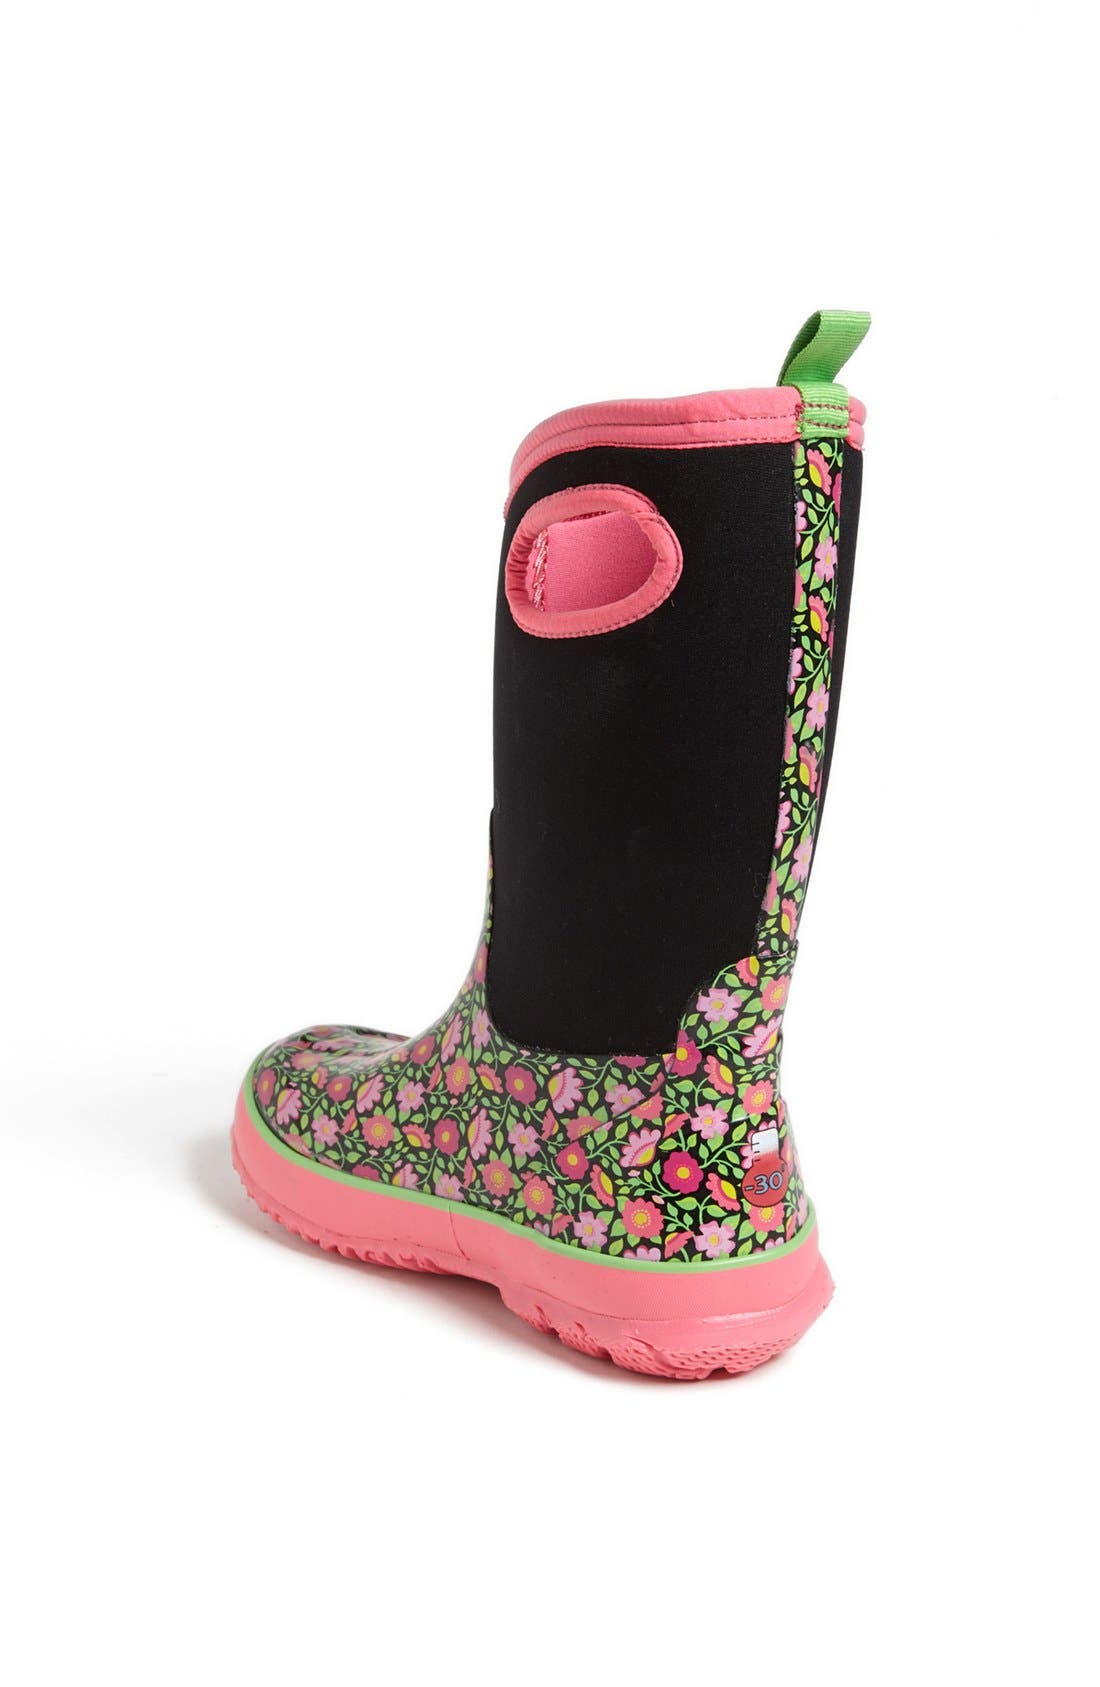 Alternate Image 2  - Bogs 'Classic High' Waterproof Boot (Walker, Toddler, Little Kid & Big Kid)